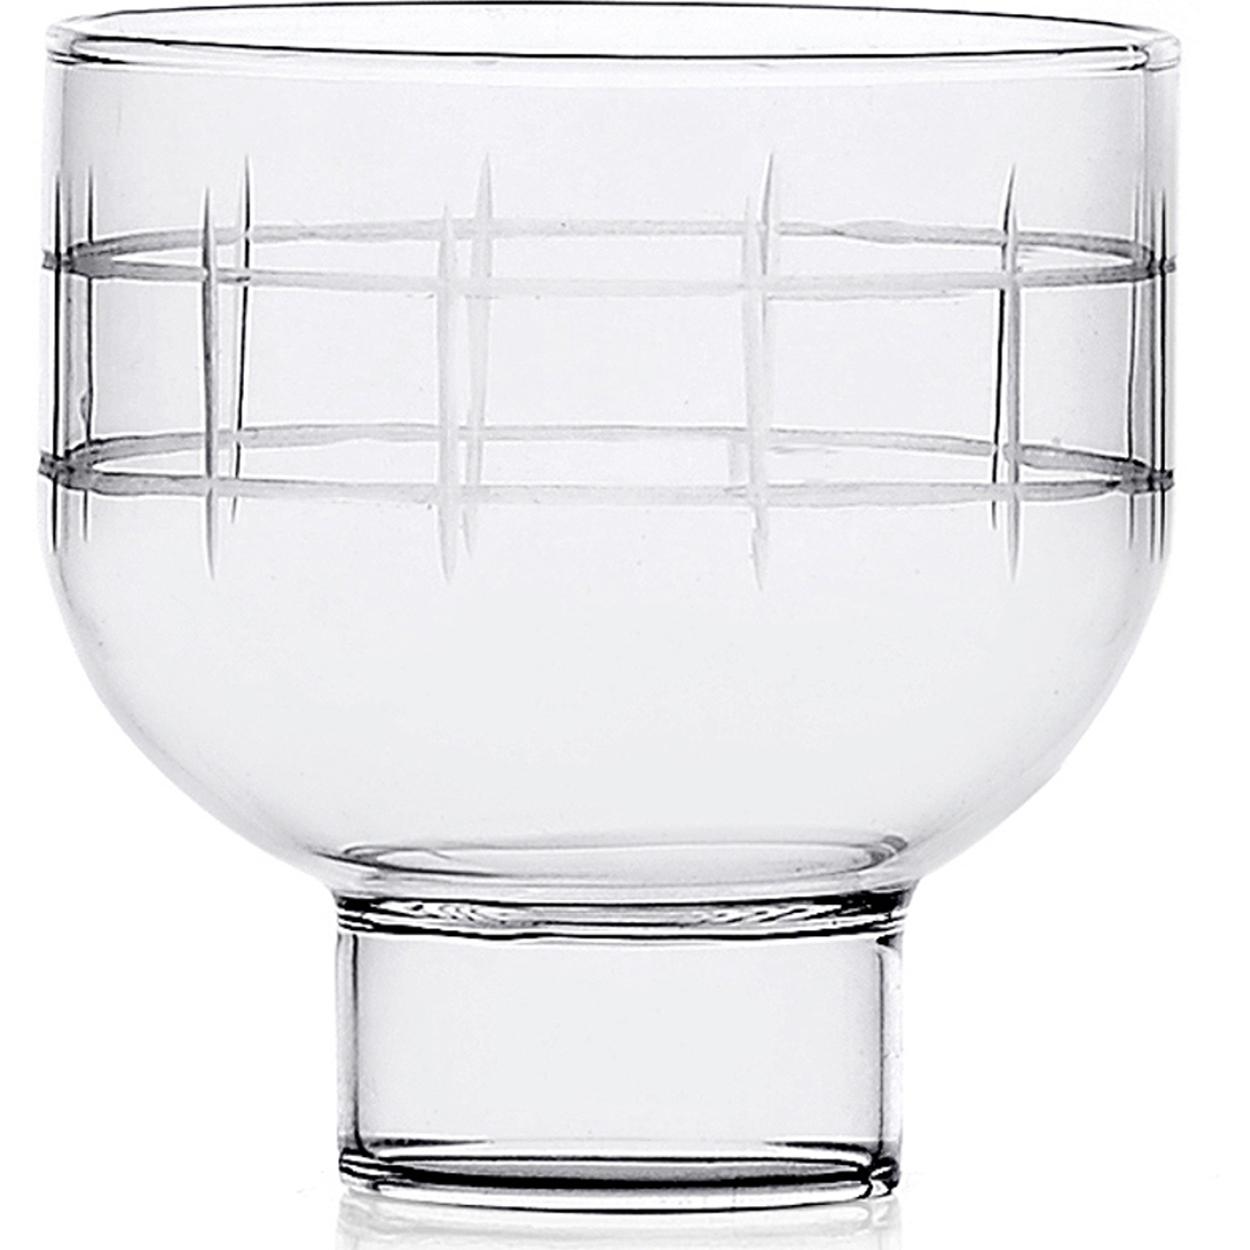 Designové šálky Wabi Sabi Cup